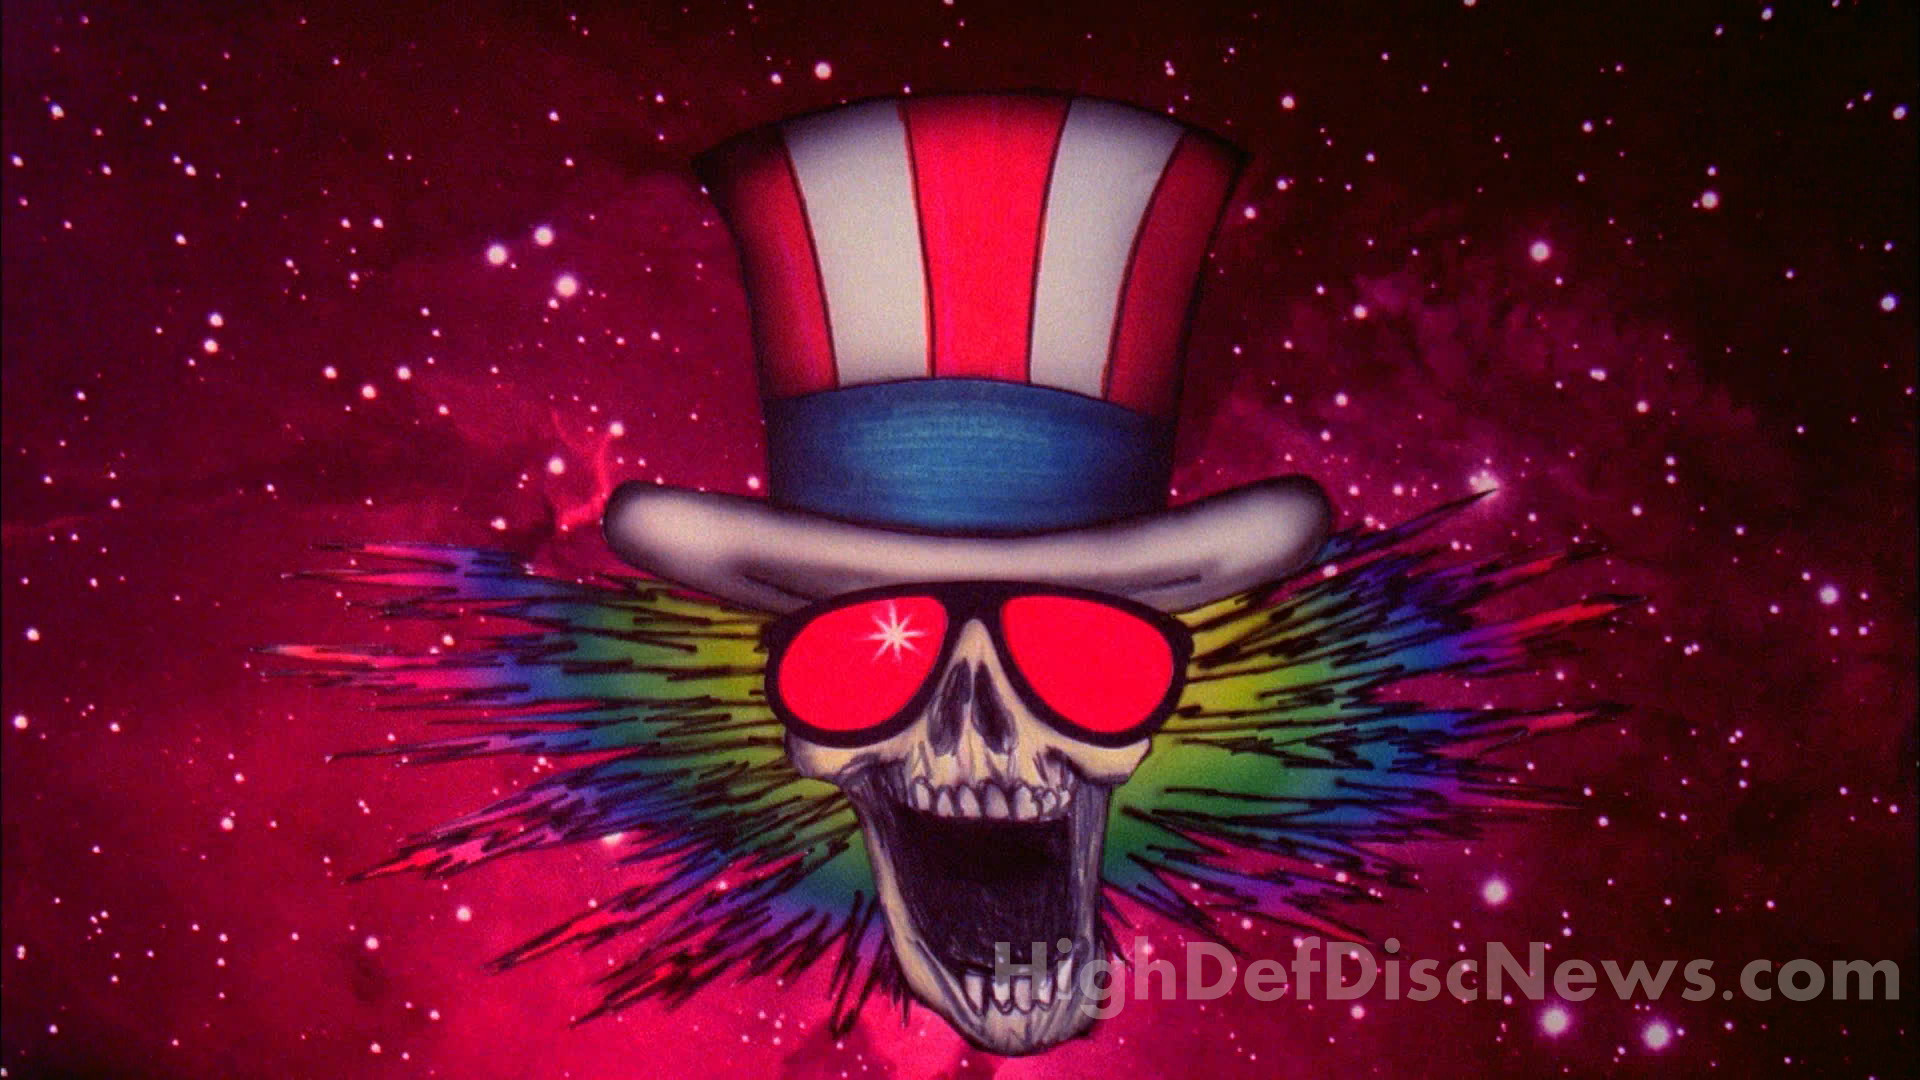 Grateful Dead 50 Wallpaper (54+ Images